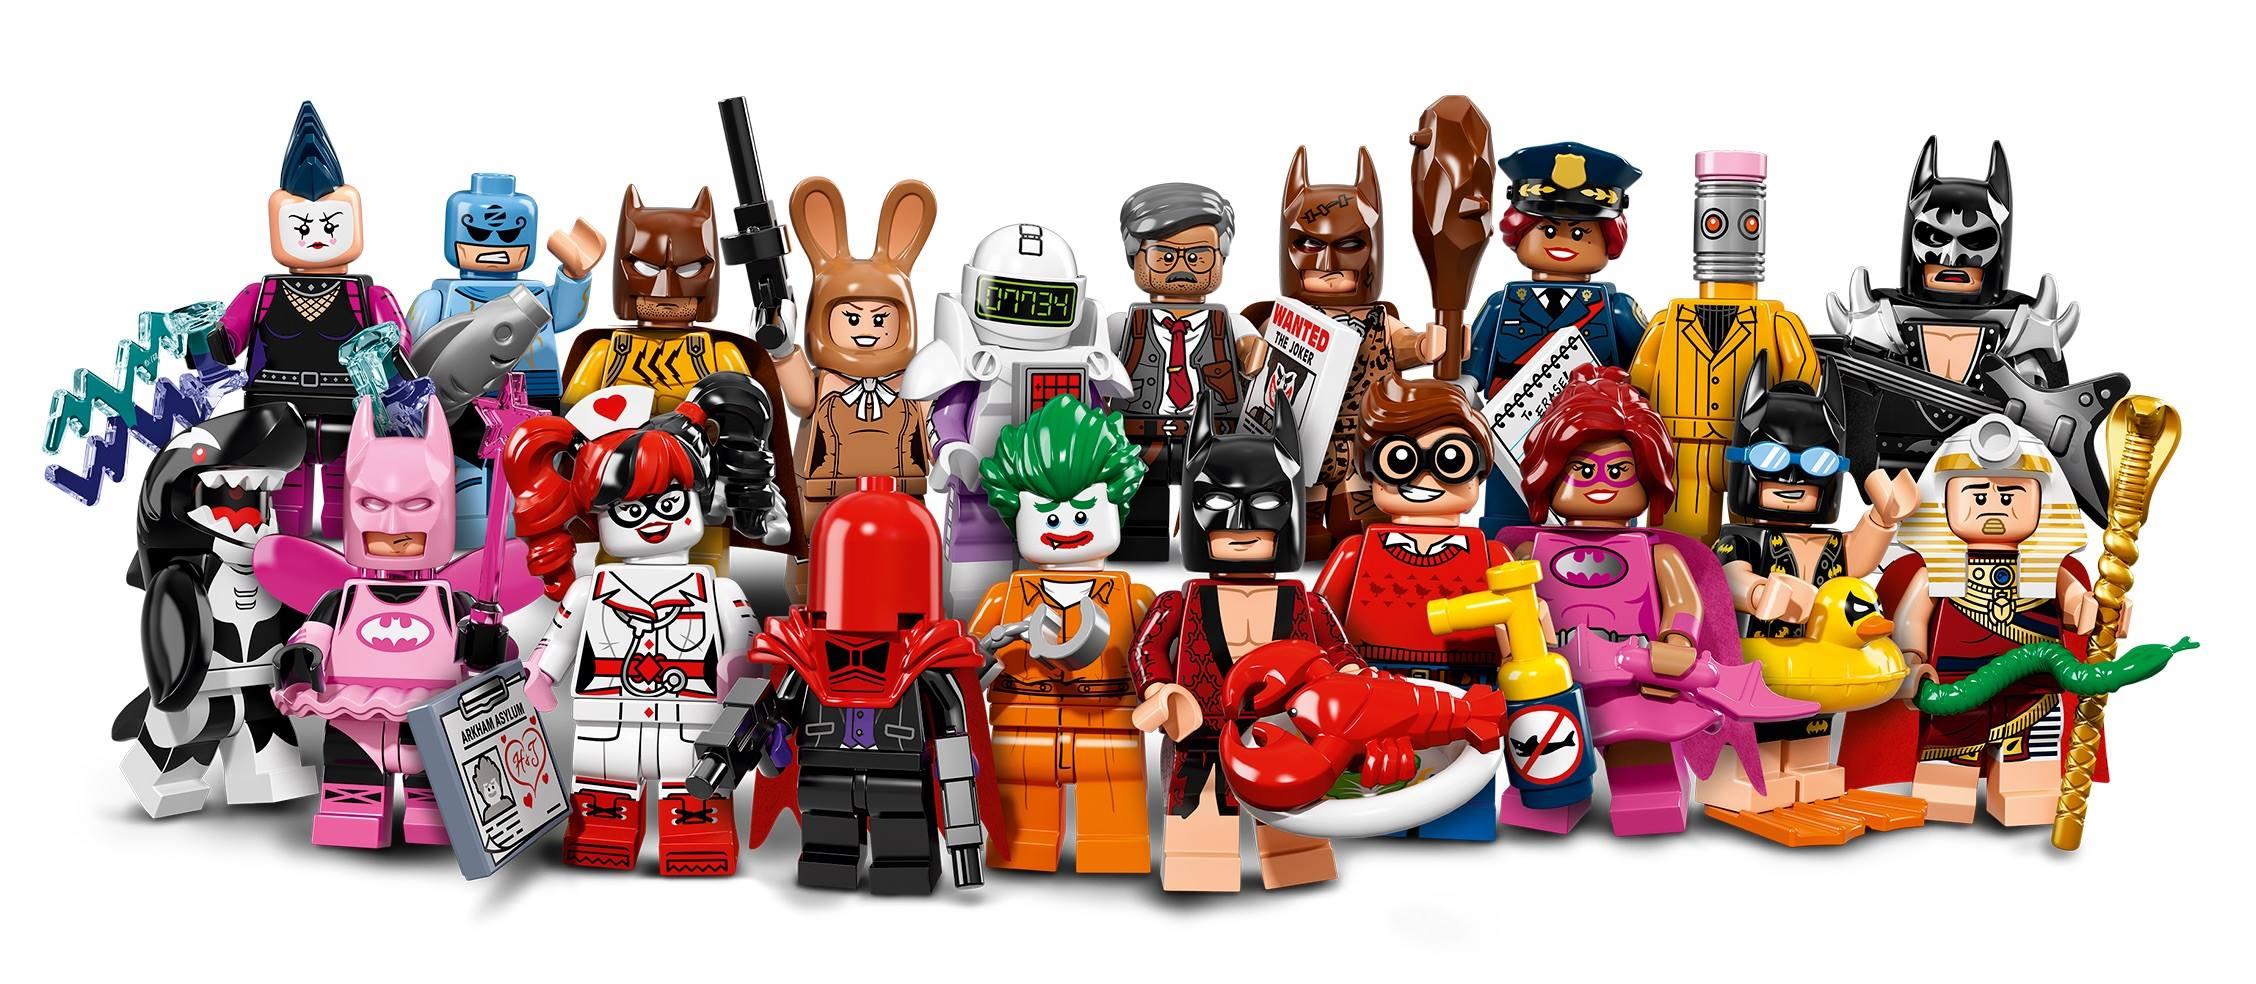 LEGO NEW BATMAN MOVIE SERIES Calculator MINIFIGURE 71017 FIGURE